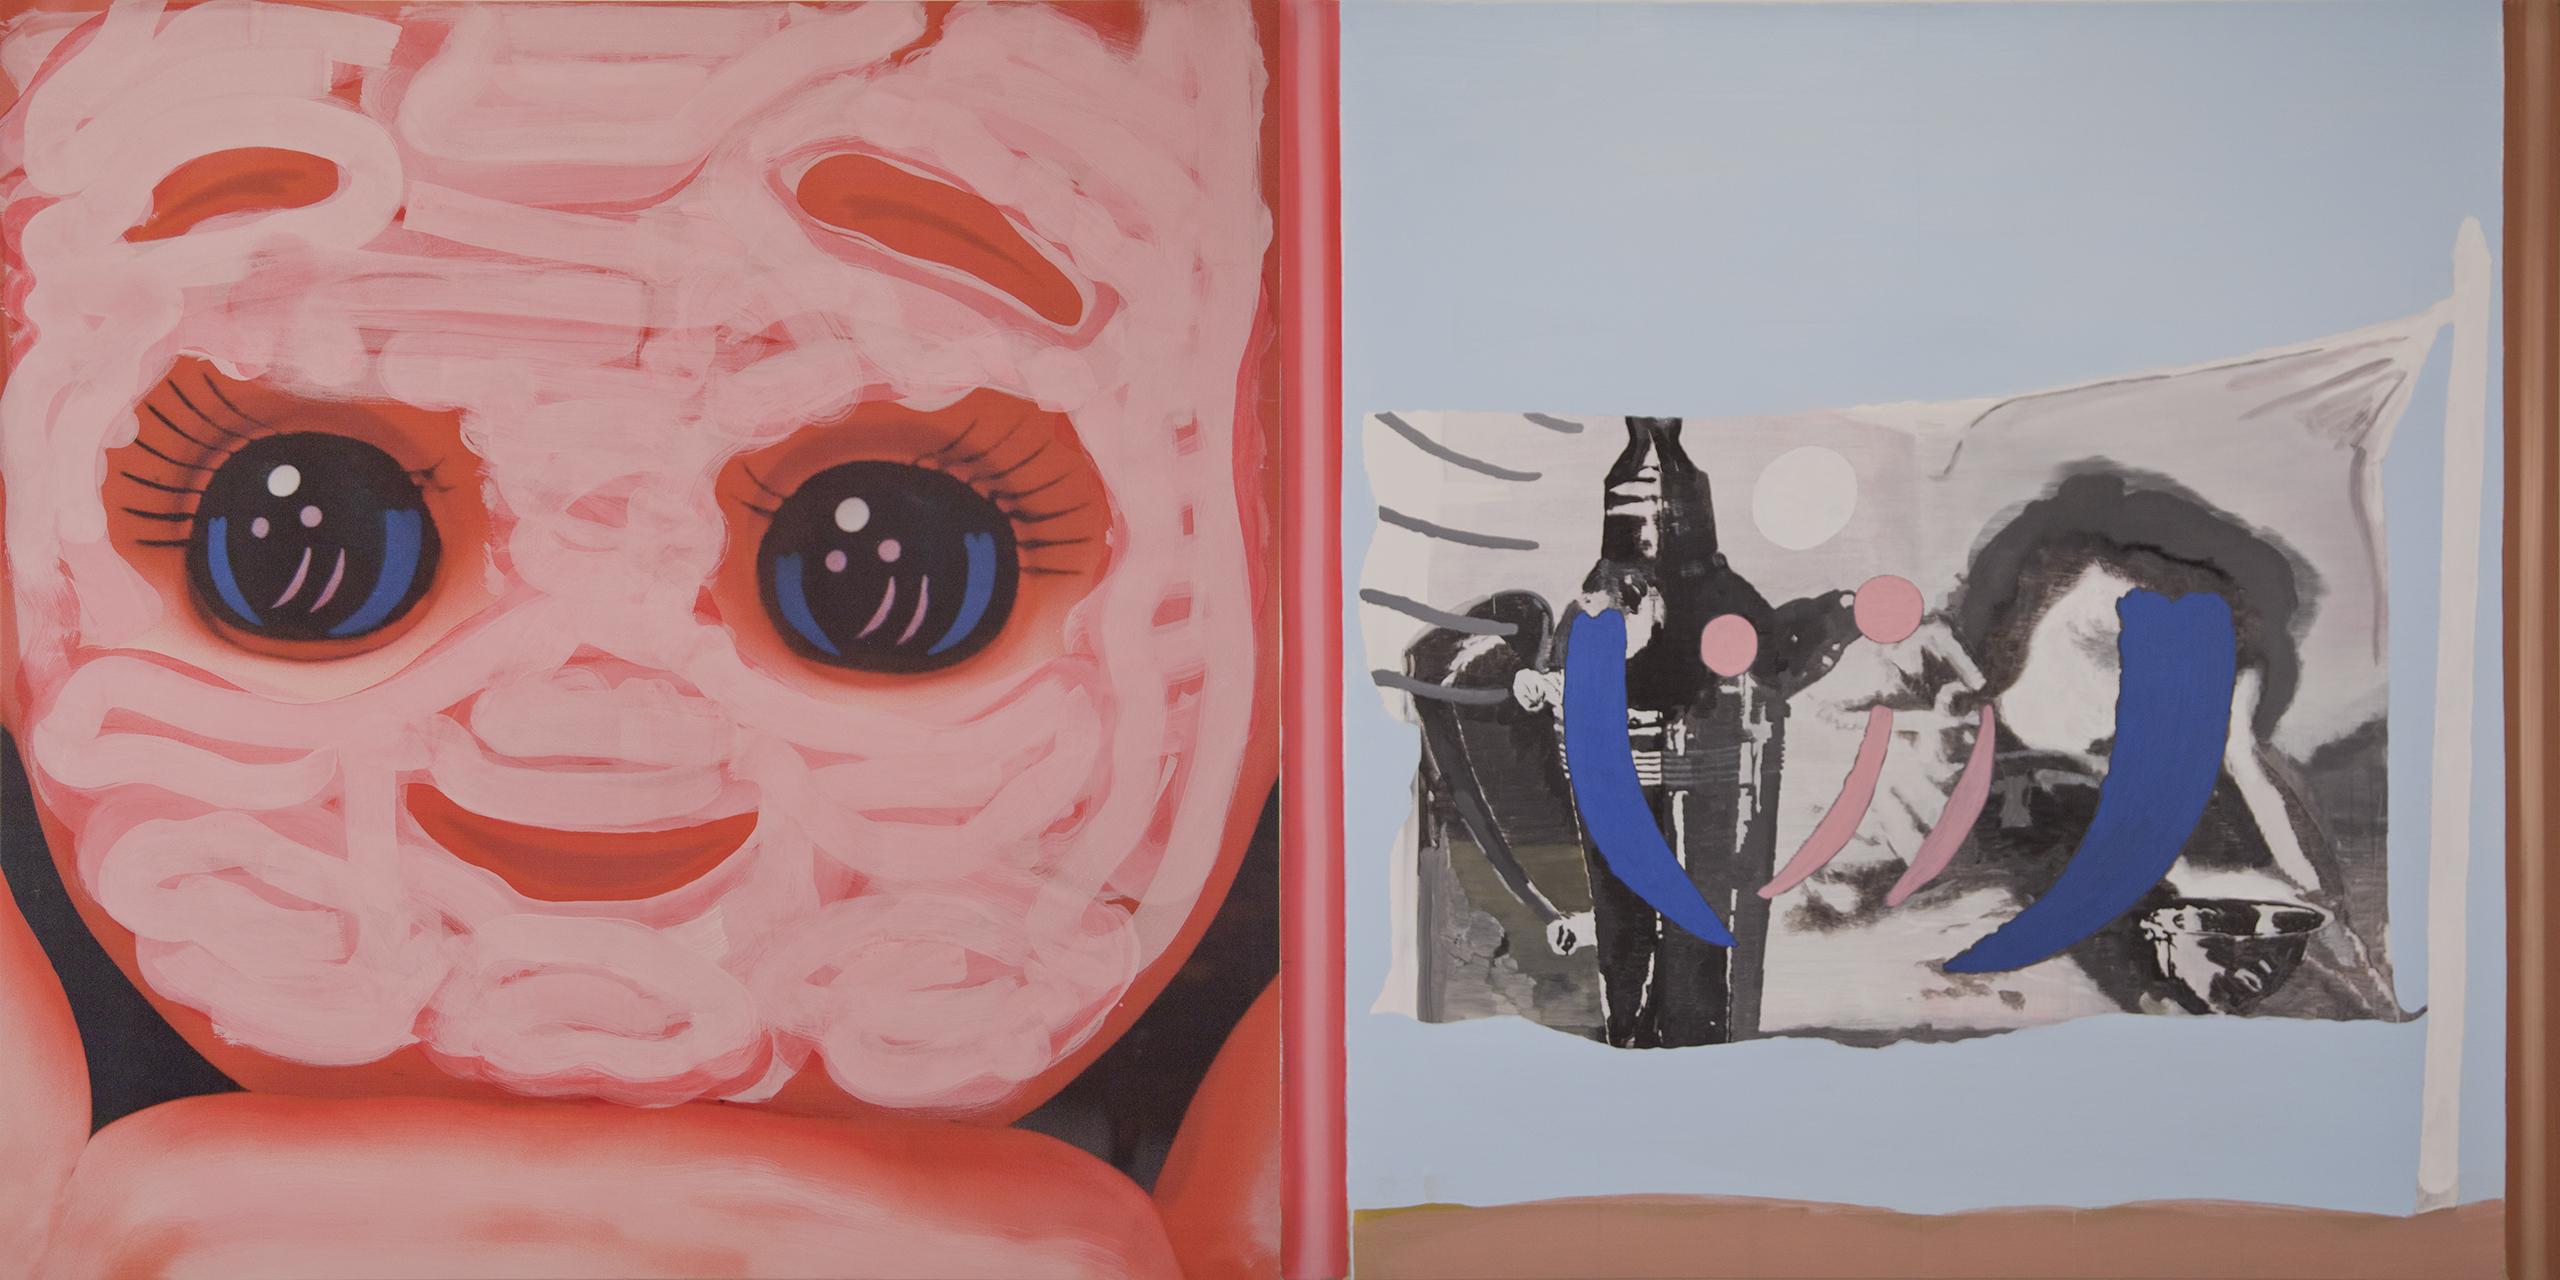 11_Robert_Smit_Hard_Head_Art_Ad_2010_acrylic_tempera_canvas_200x400cm_1280_hoog